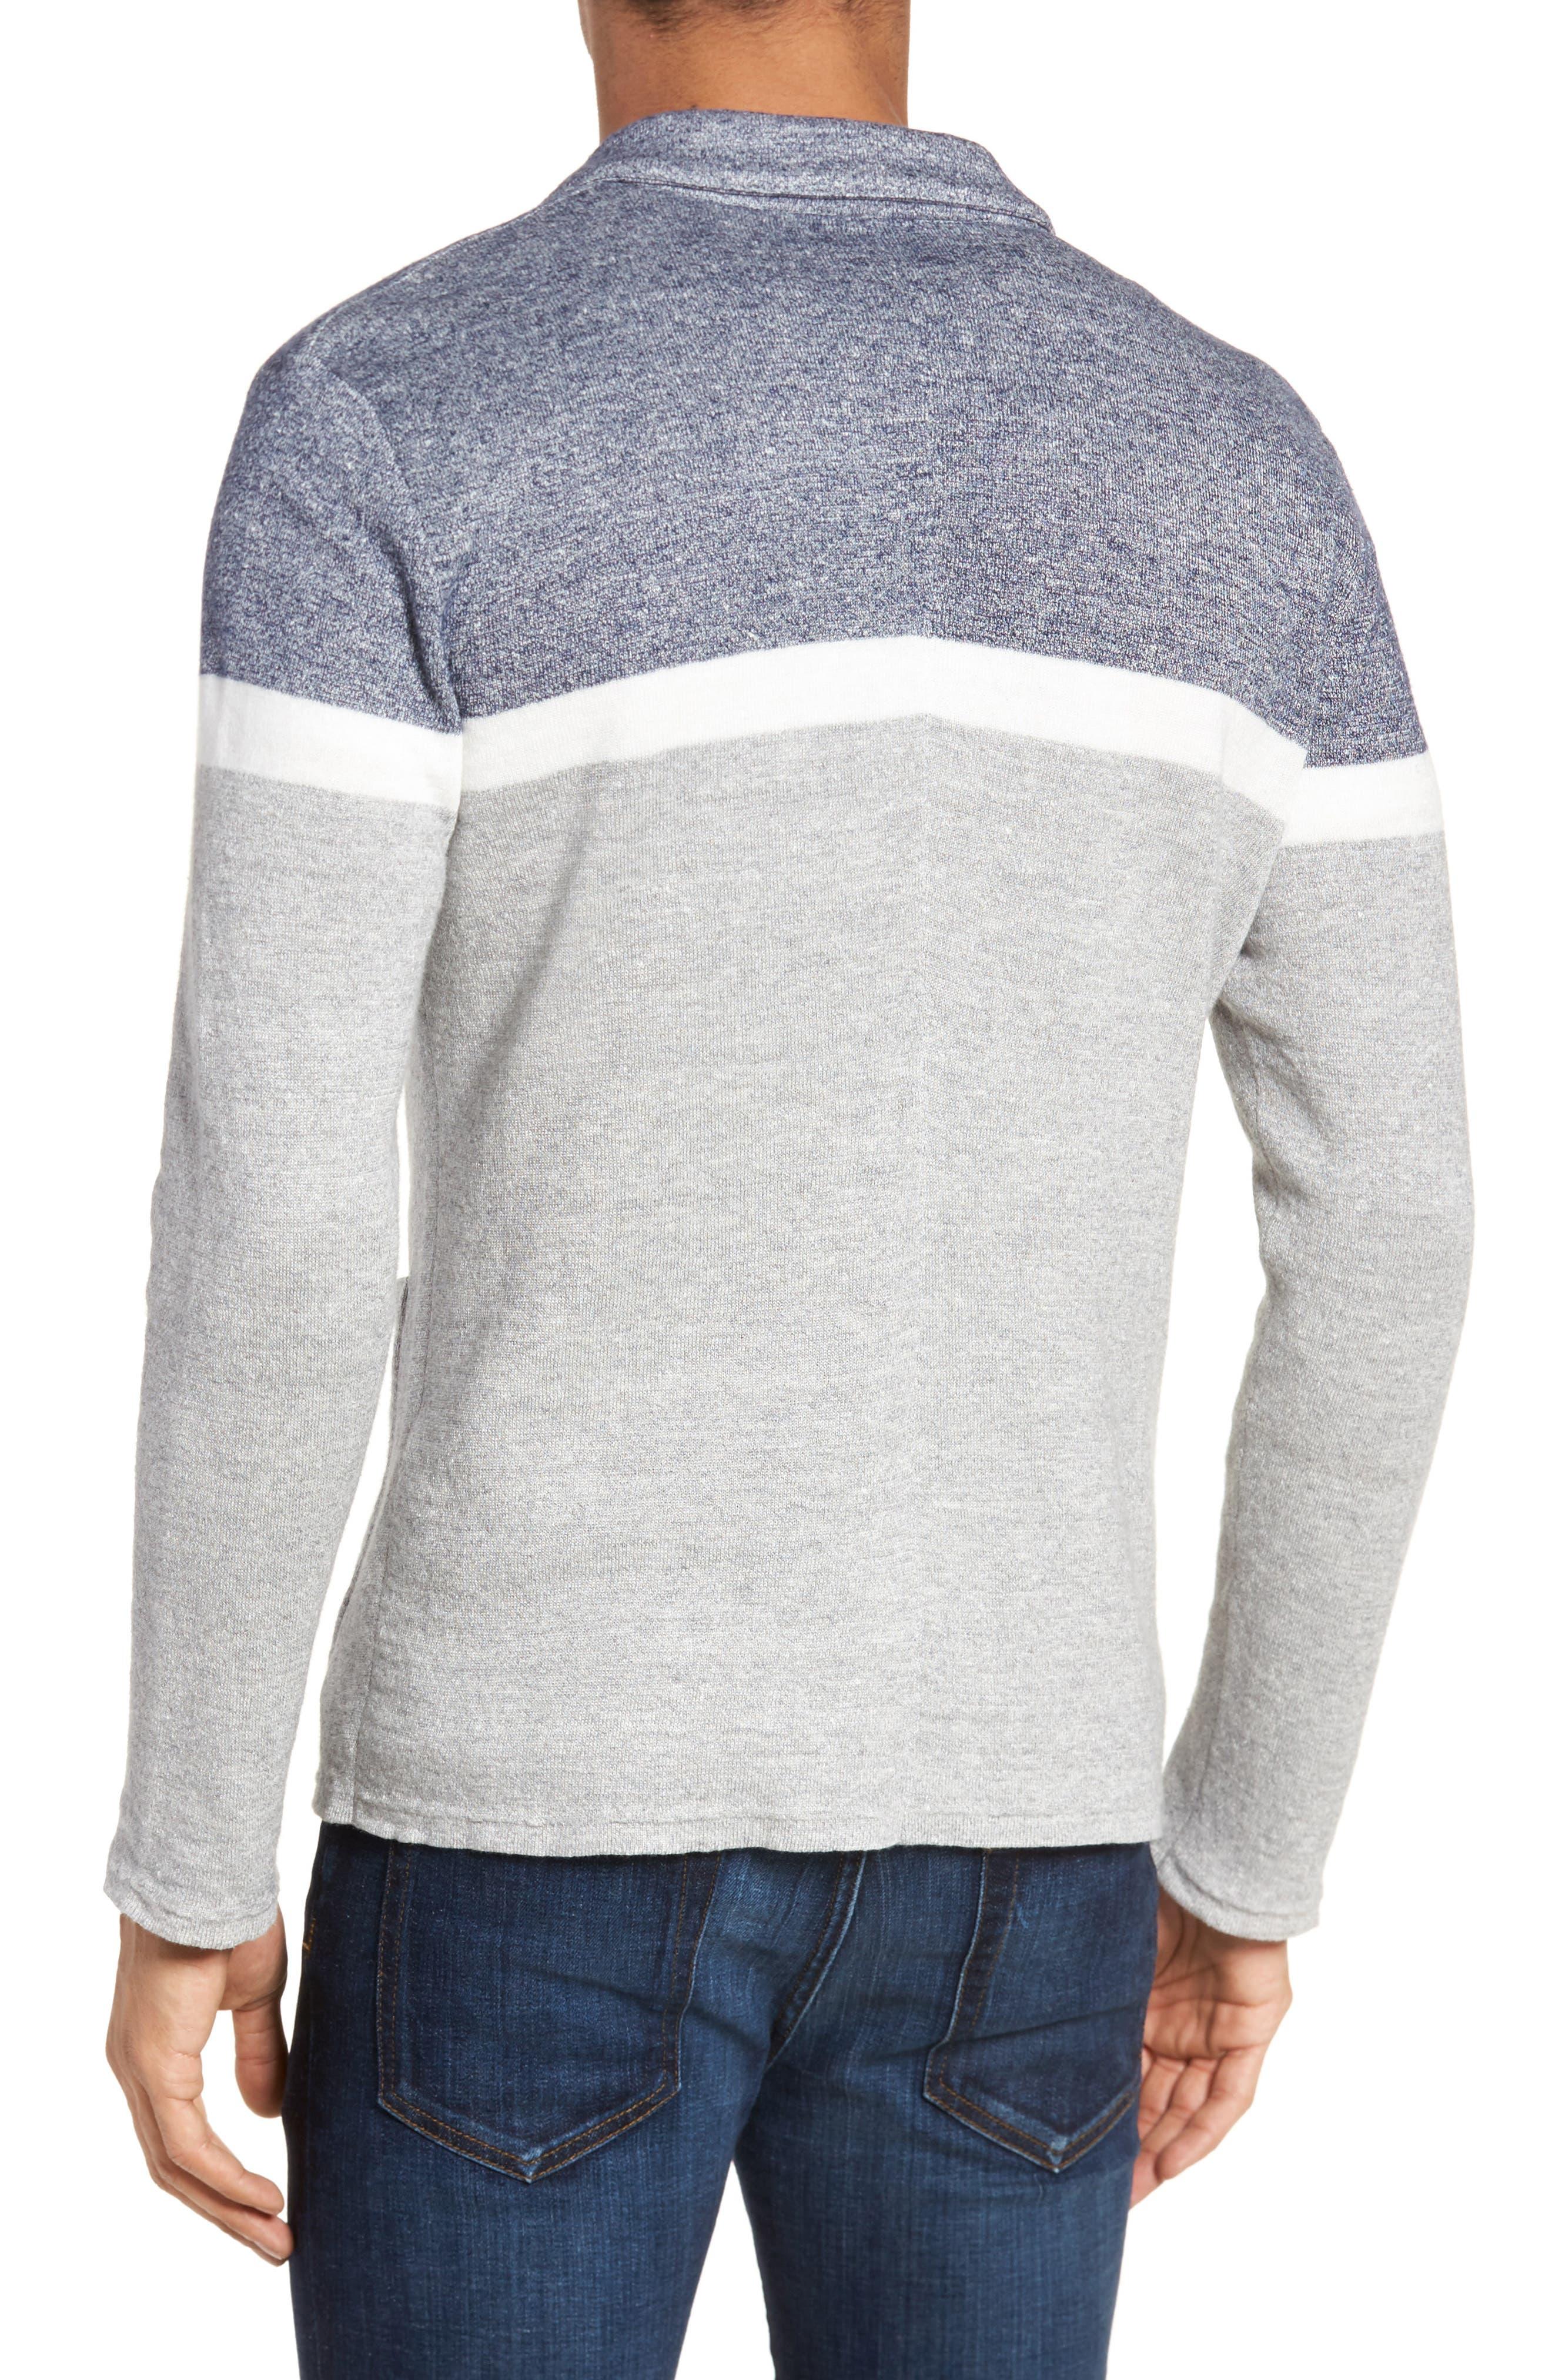 Colorblock Sweater Jacket,                             Alternate thumbnail 2, color,                             Grey